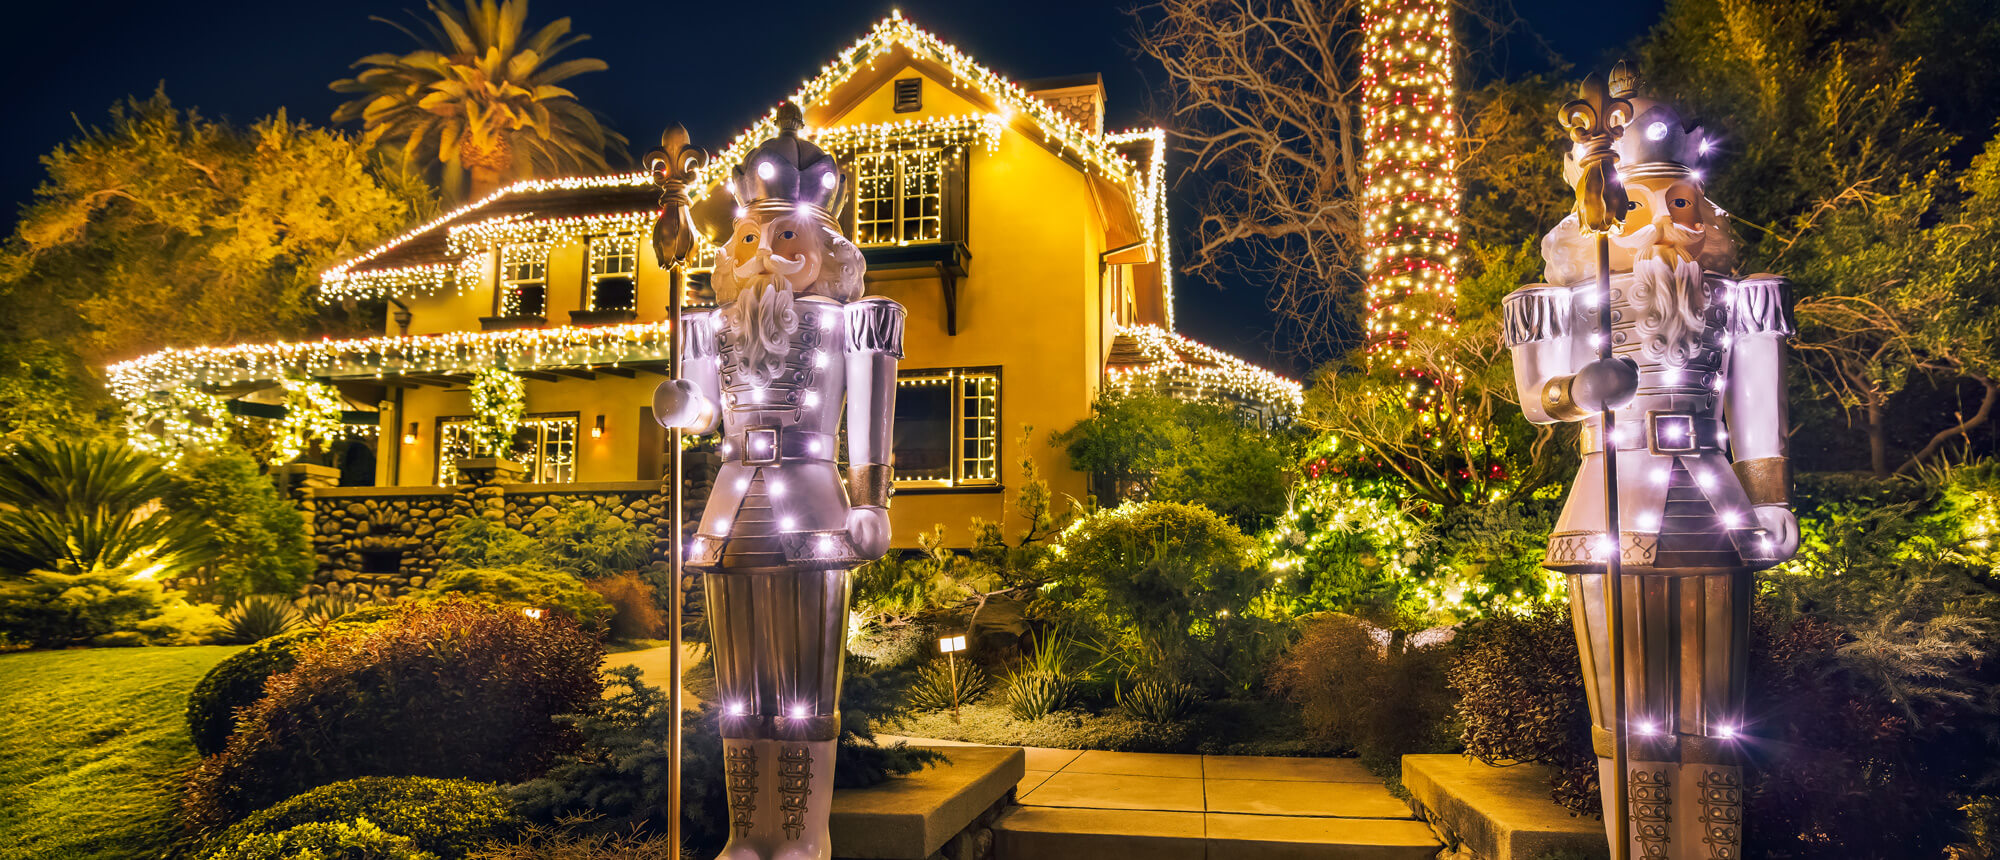 Classica Christmas Decorations